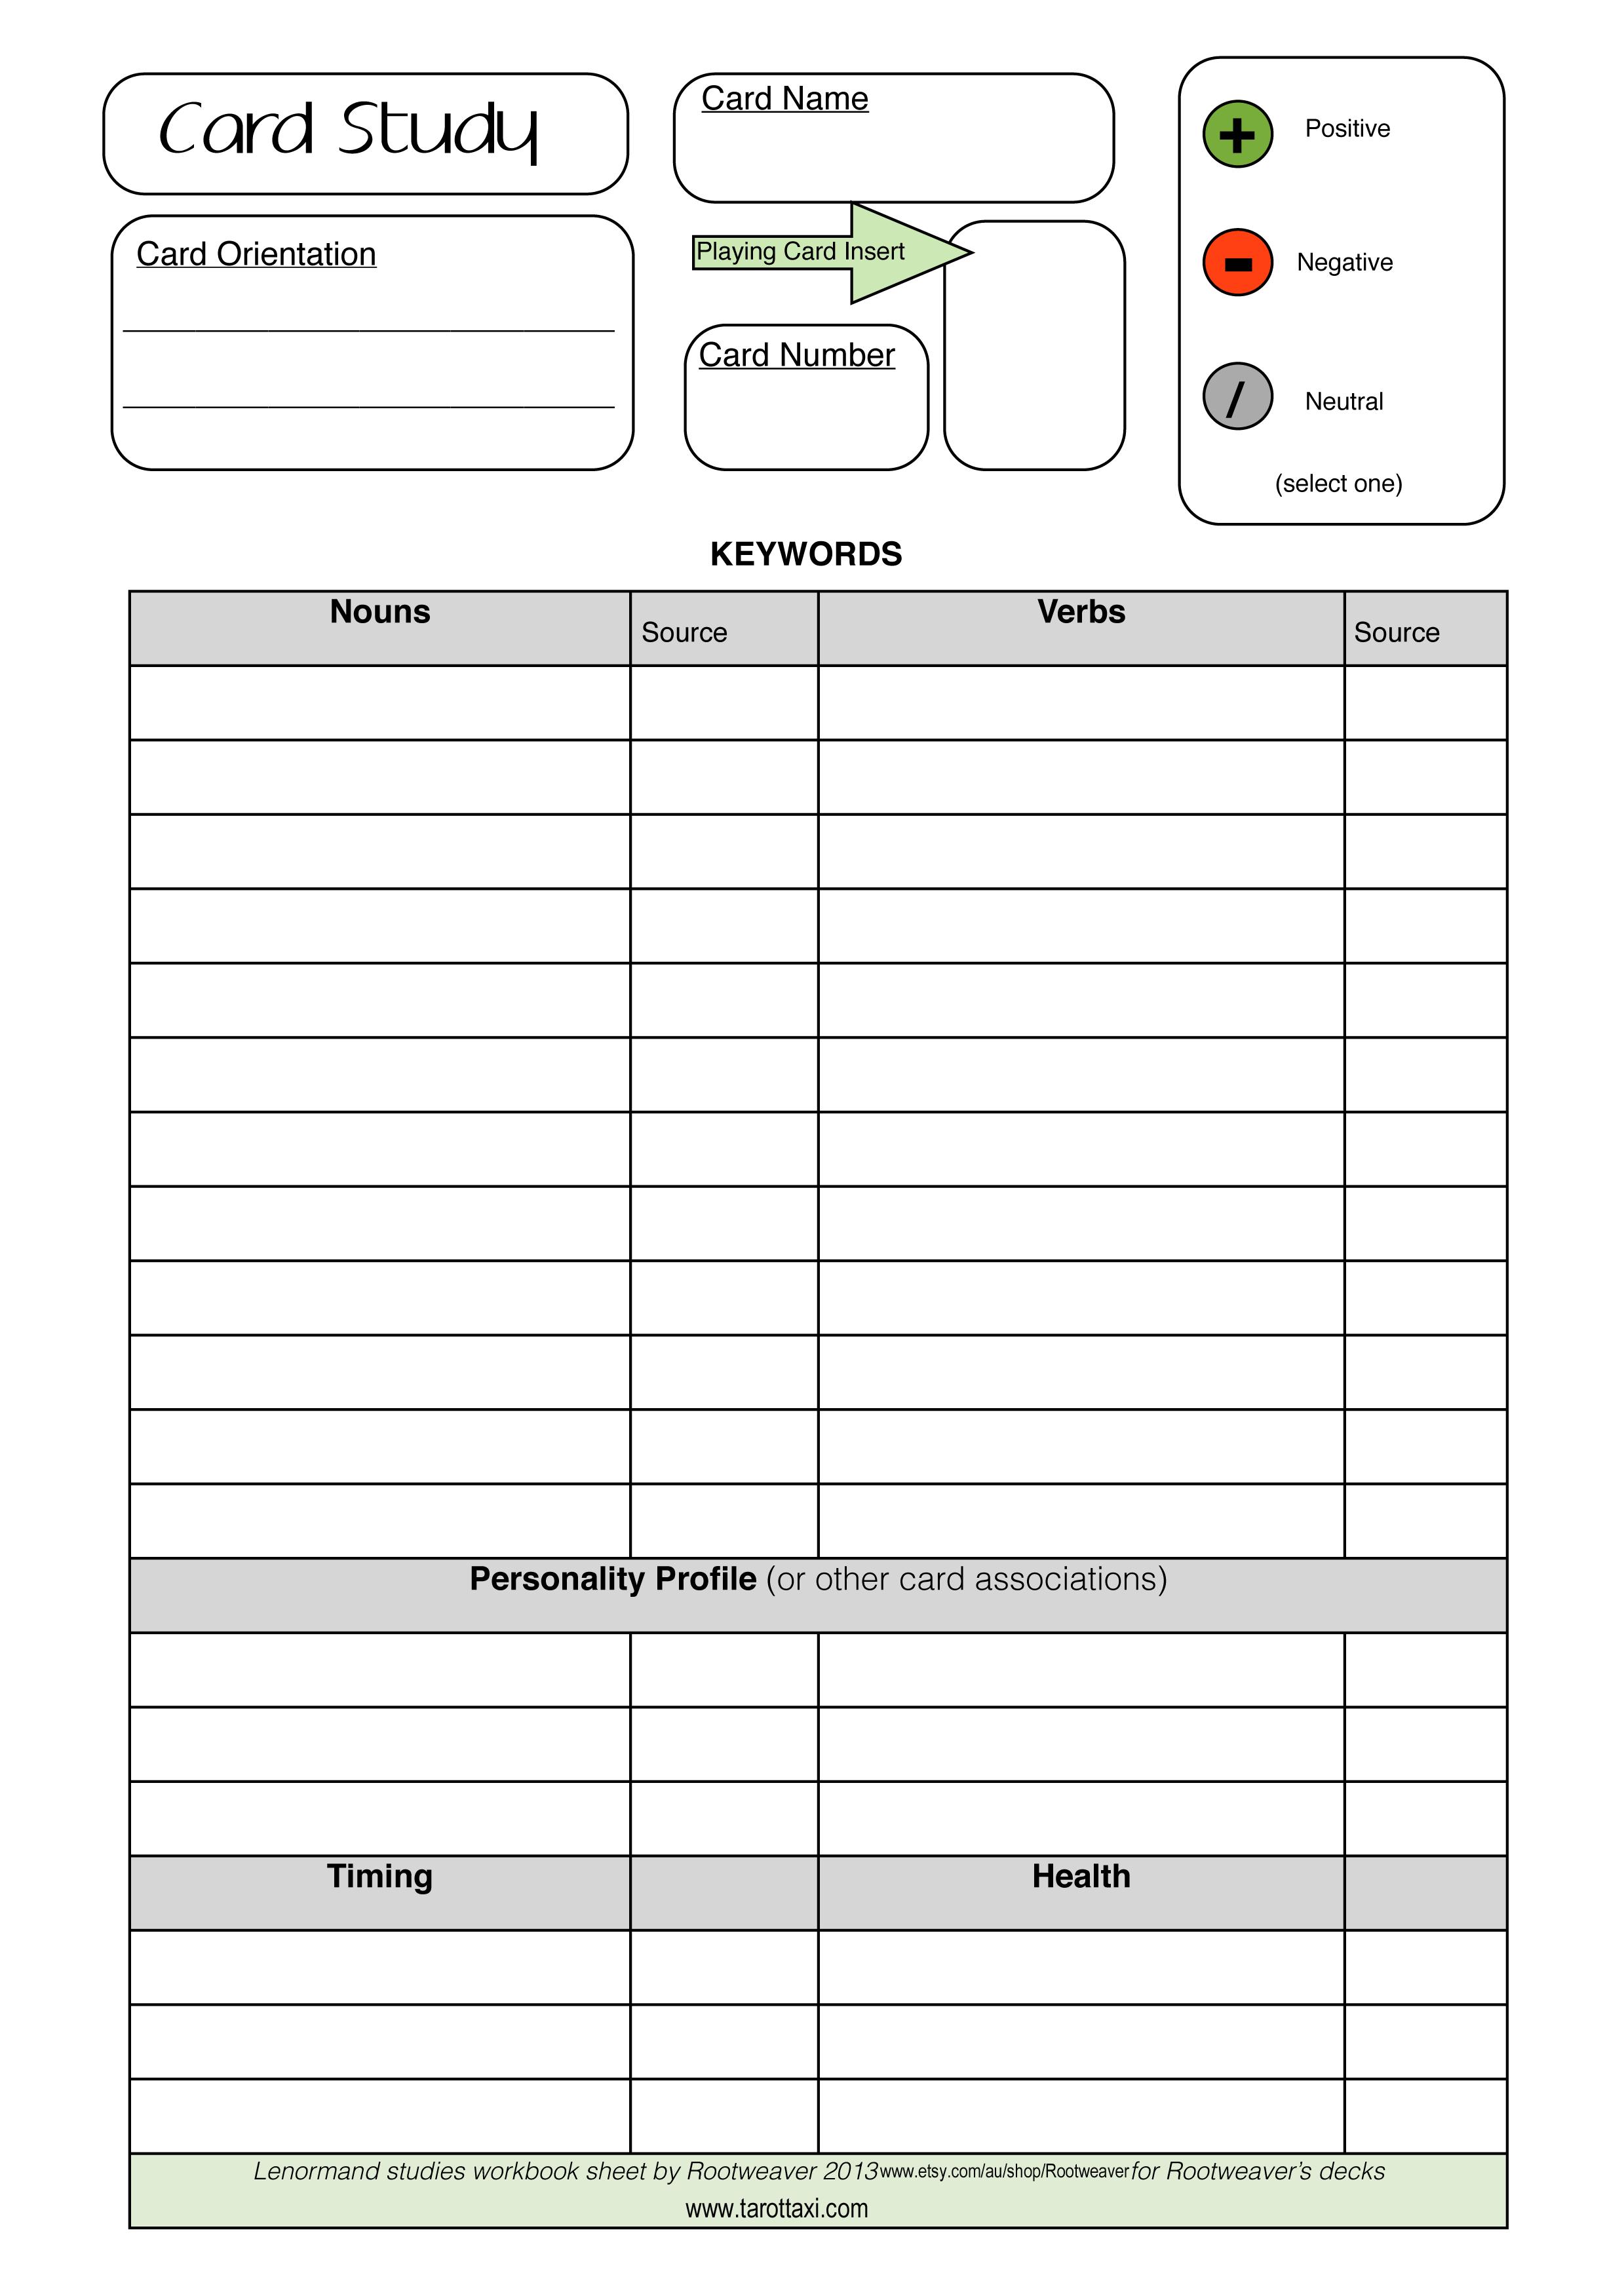 Lenormand Worksheet Free Download Tarot Learning Tarot Cards Tarot Tips [ 3504 x 2478 Pixel ]